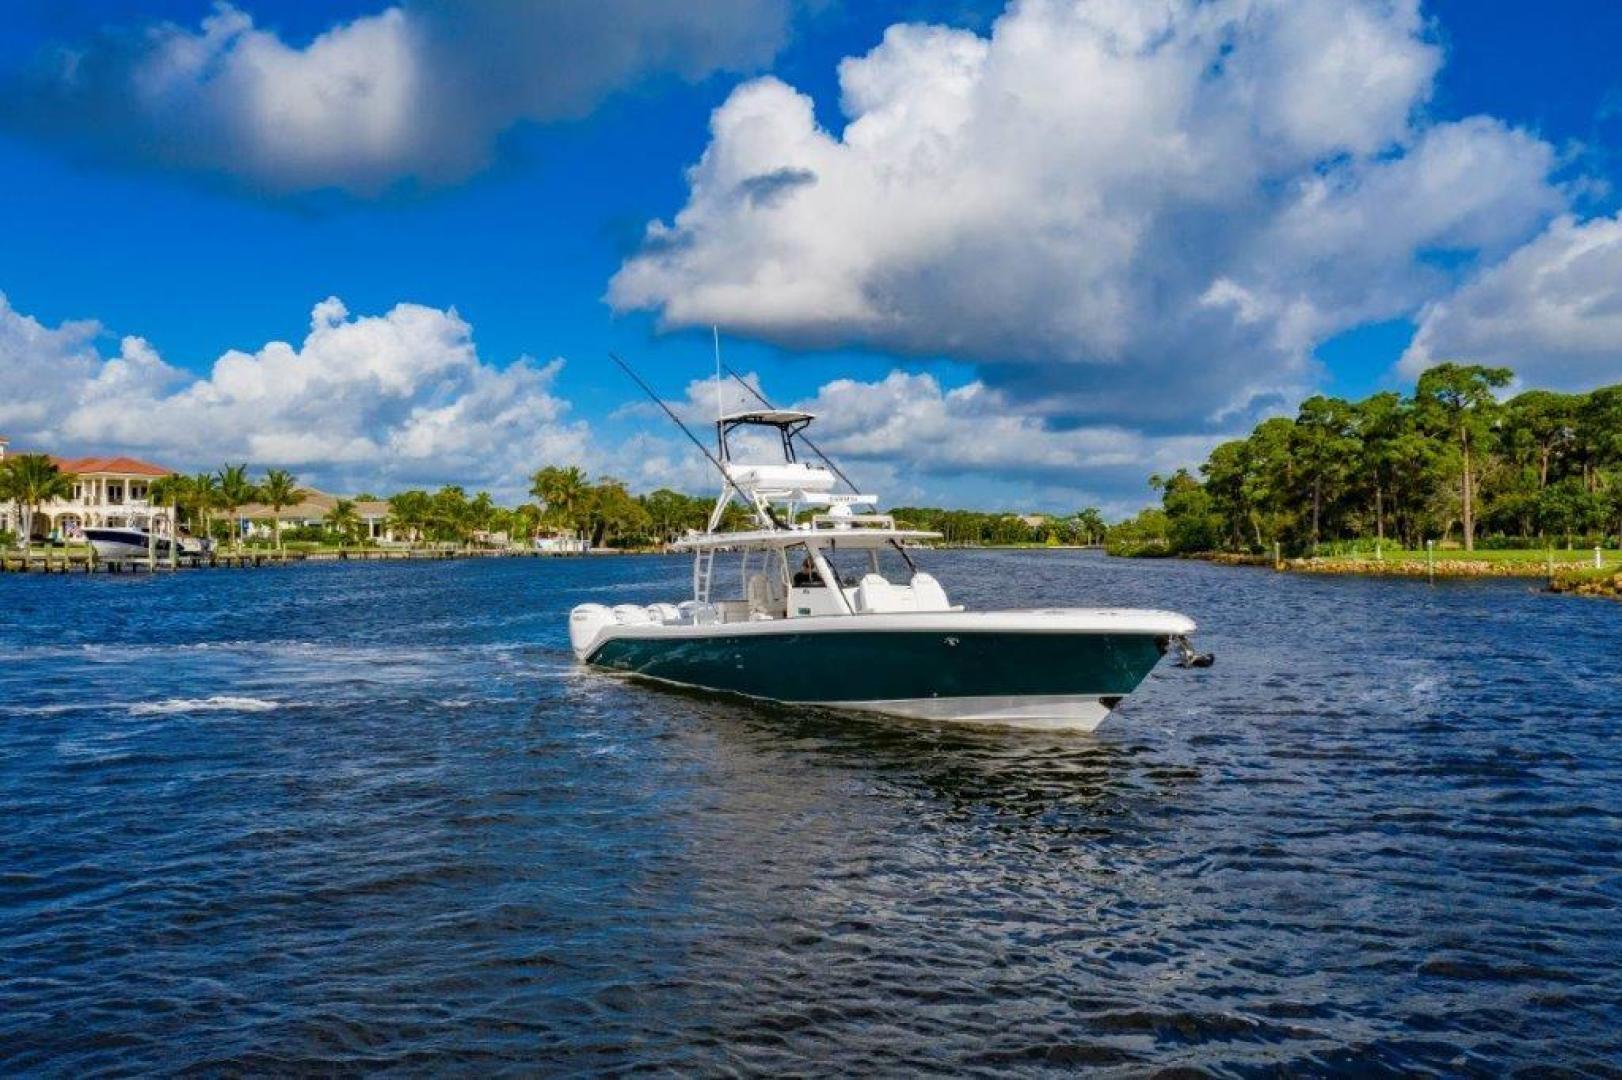 Everglades-435 Center Console 2019-Bahama Papa Palm Beach Gardens-Florida-United States-Bahama Papa-1570525 | Thumbnail